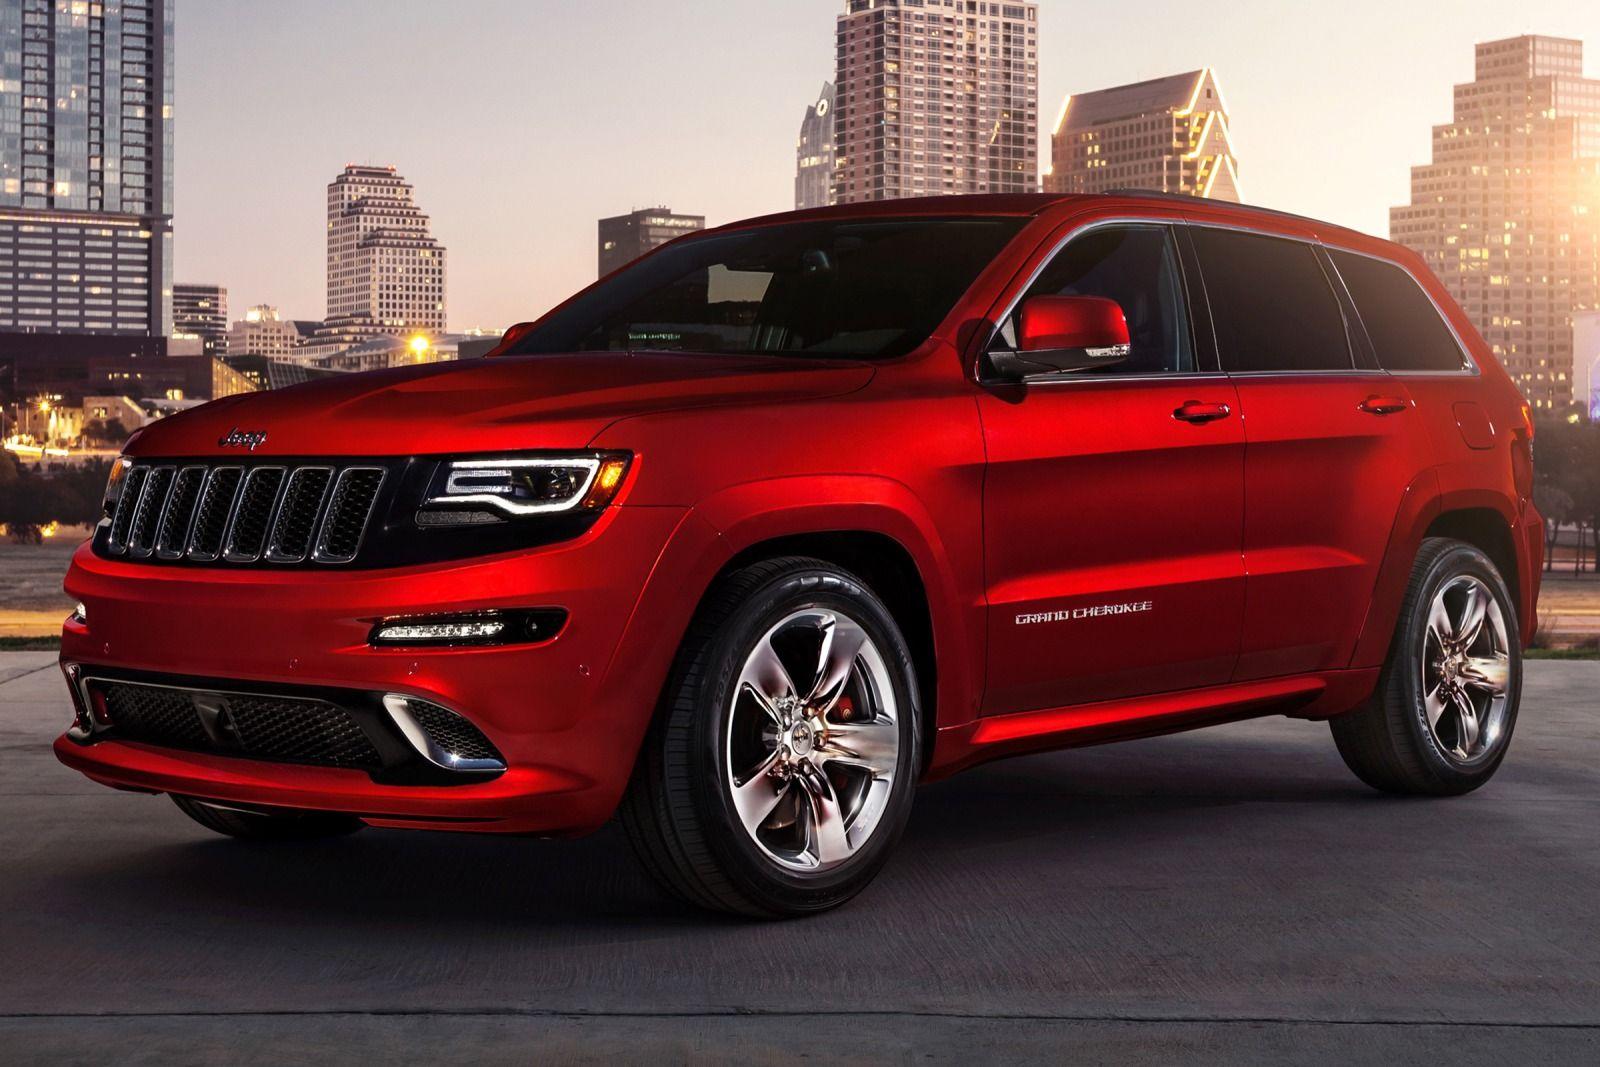 2015-jeep-grand-cherokee-B